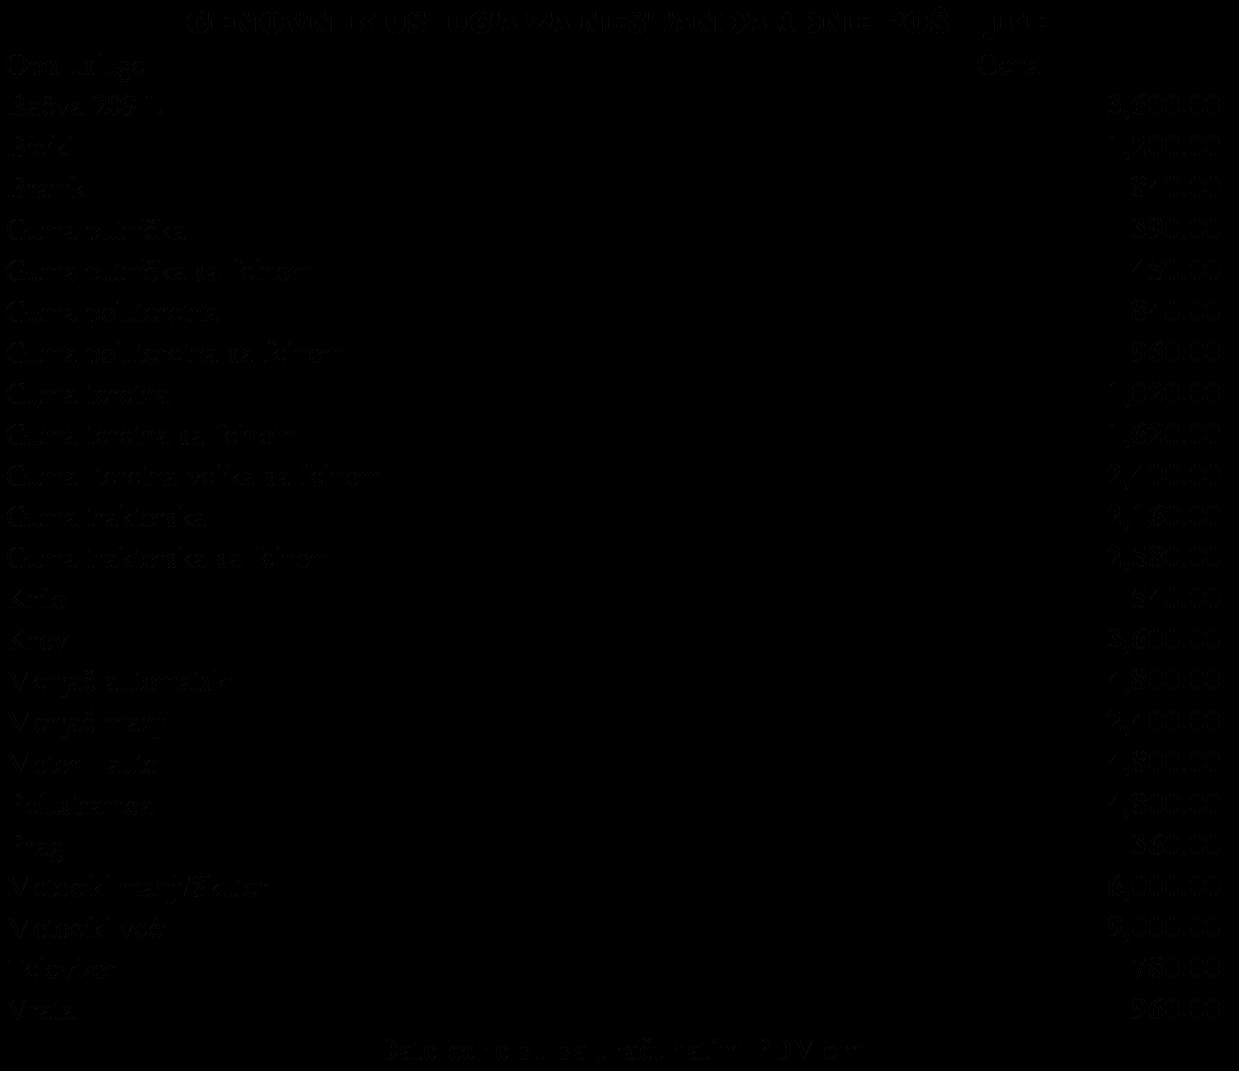 image008v